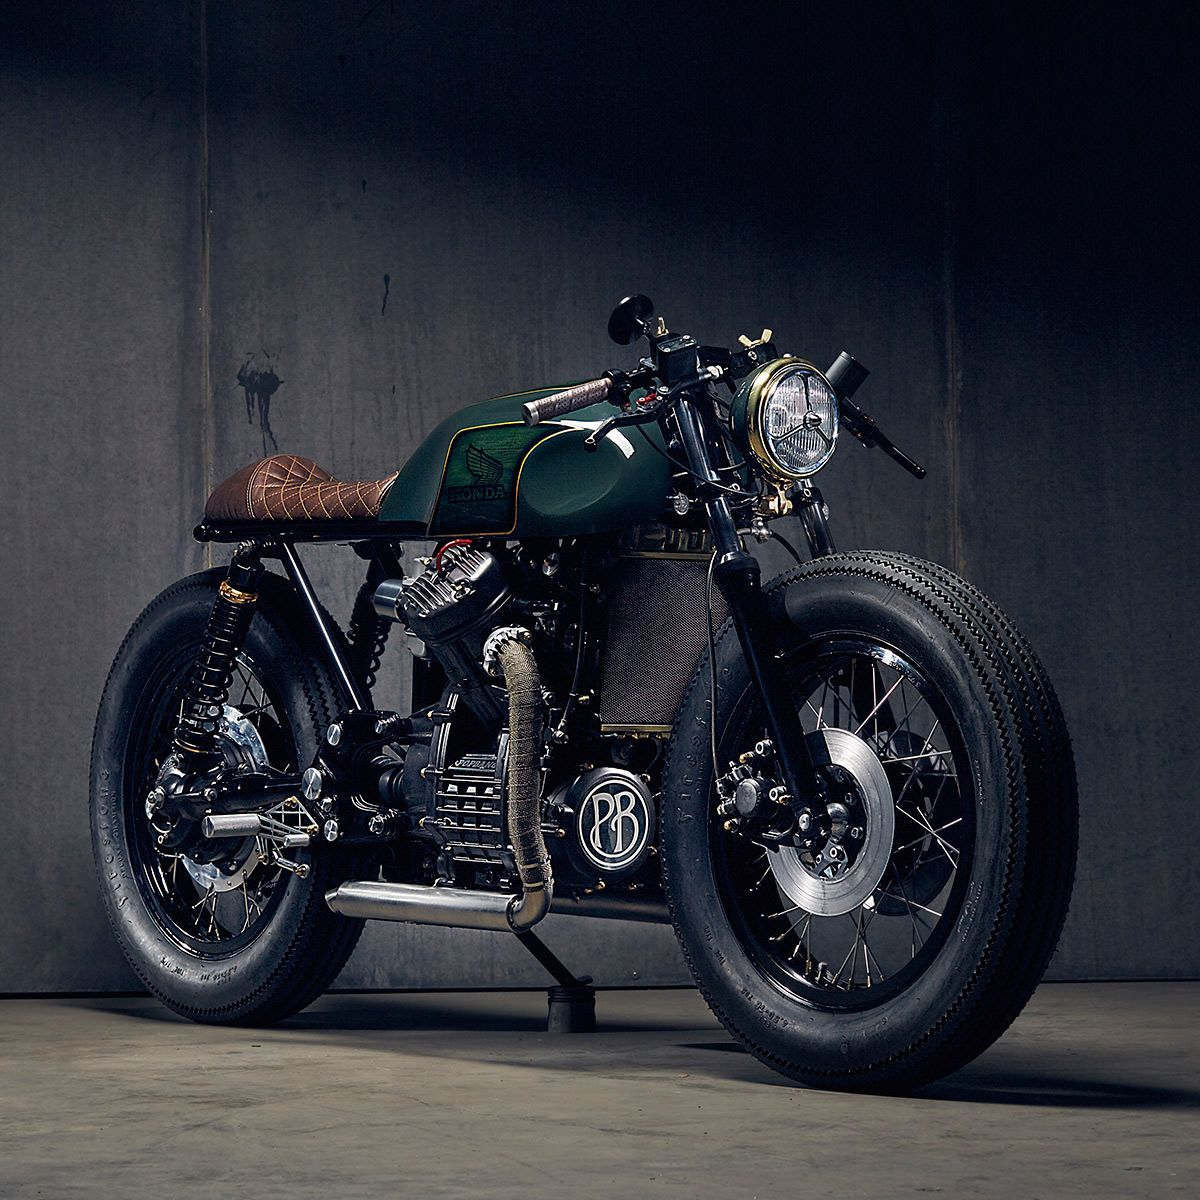 bad917d1cbbd2b355d3874f98e351fe2 best 25 custom motorcycle parts ideas on pinterest chopper  at gsmportal.co